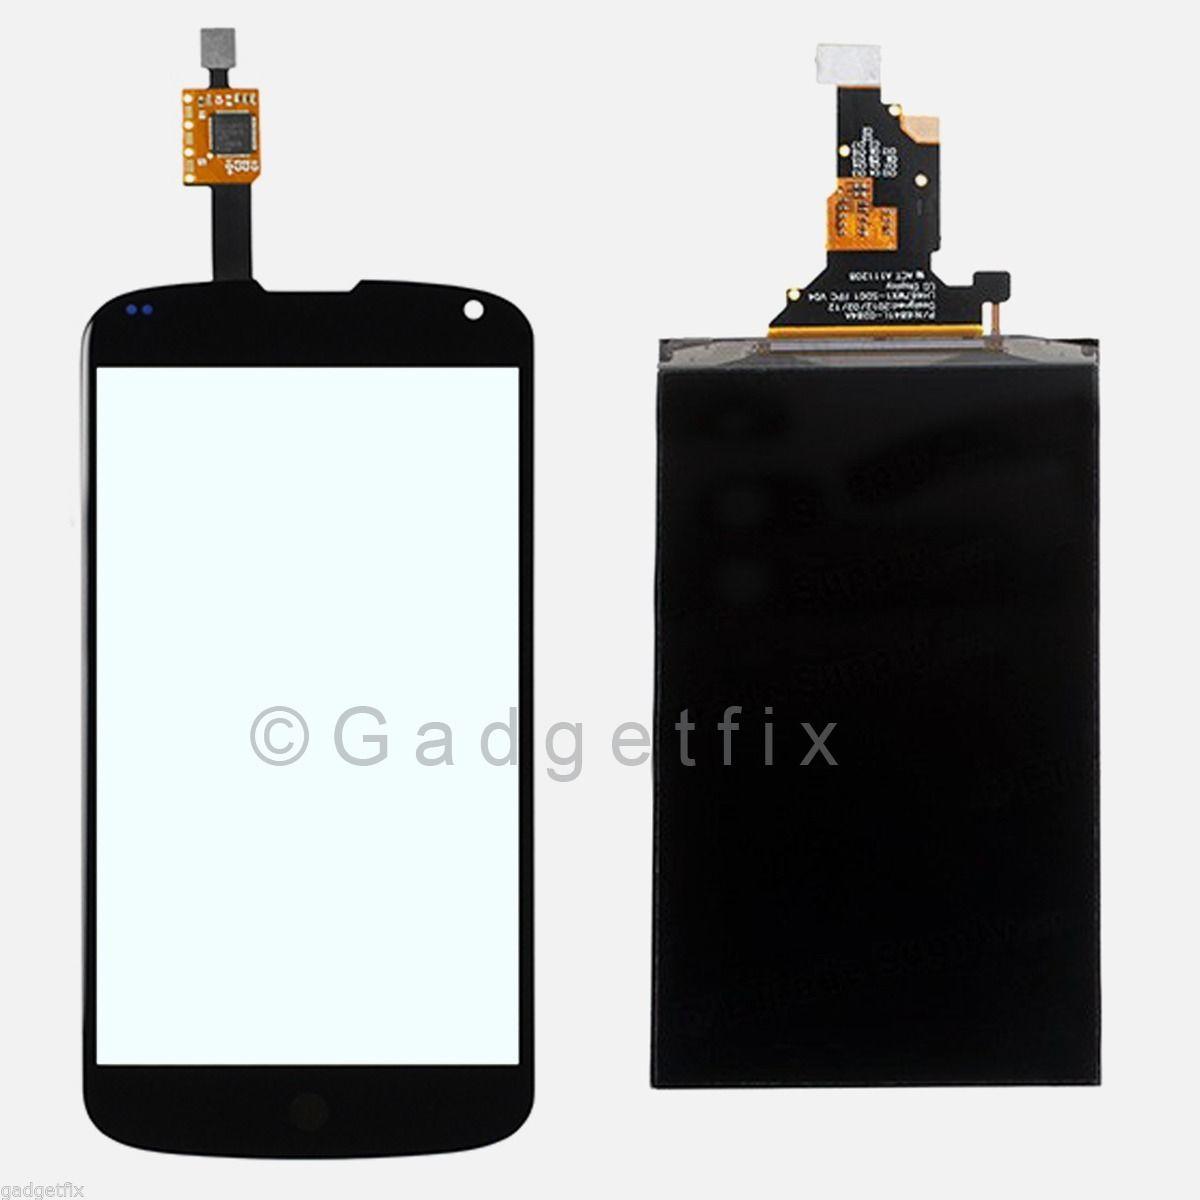 LG E960 Google Nexus 4 Touch Screen Digitizer + LCD Screen Display Assembly